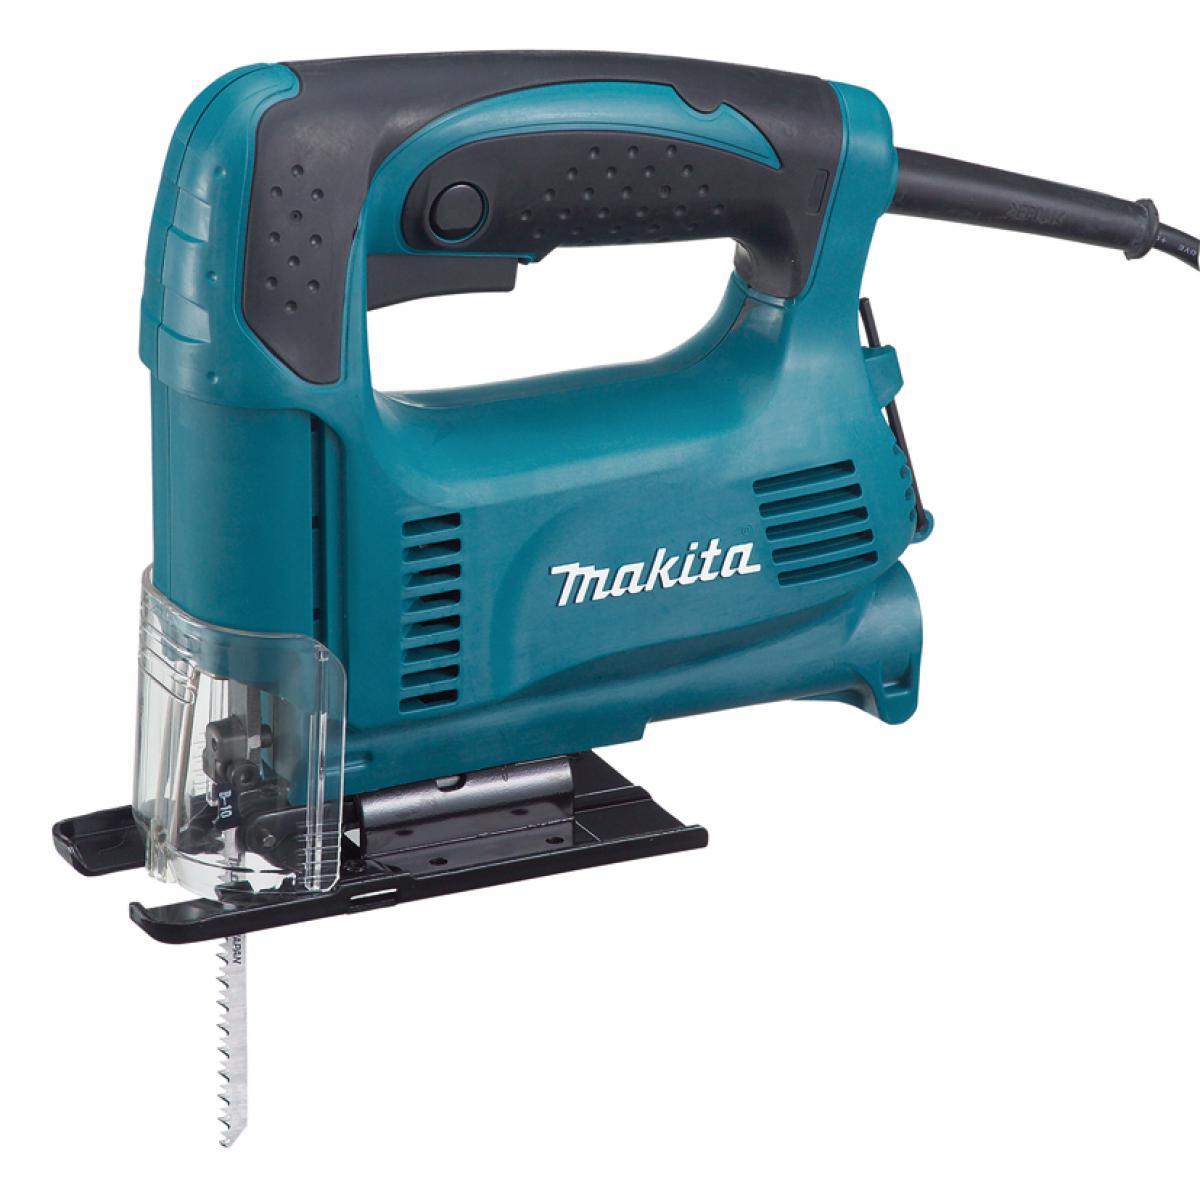 Makita Makita - Scie sauteuse 450 W course 18 mm - 4326